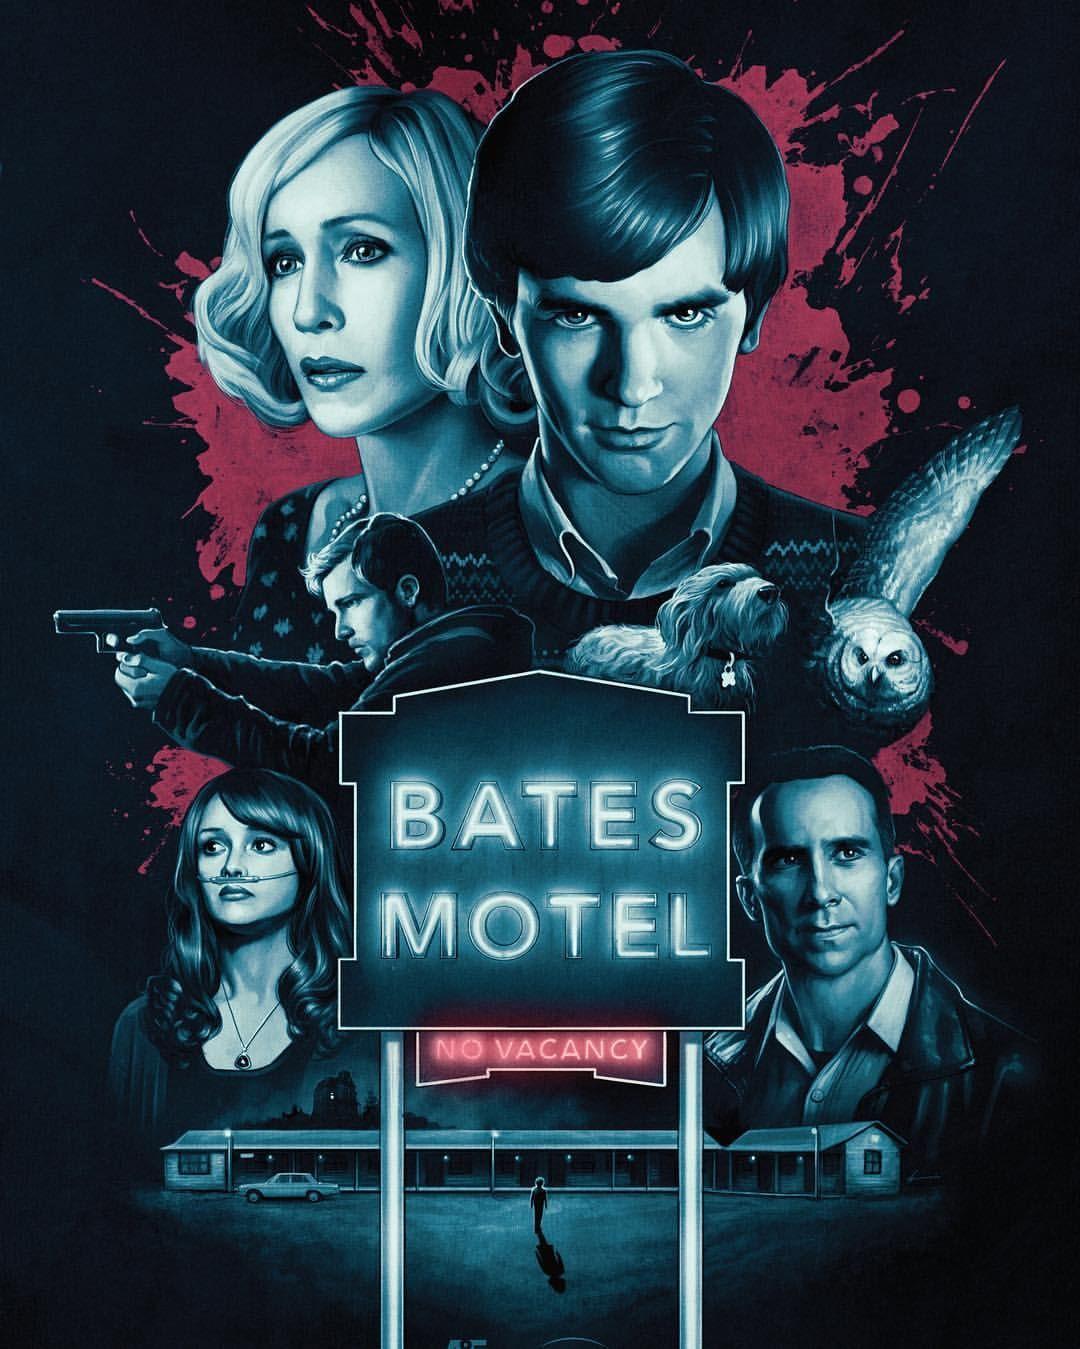 Bates Motel By Justin Erickson Bates Motel Norman Bates Motel